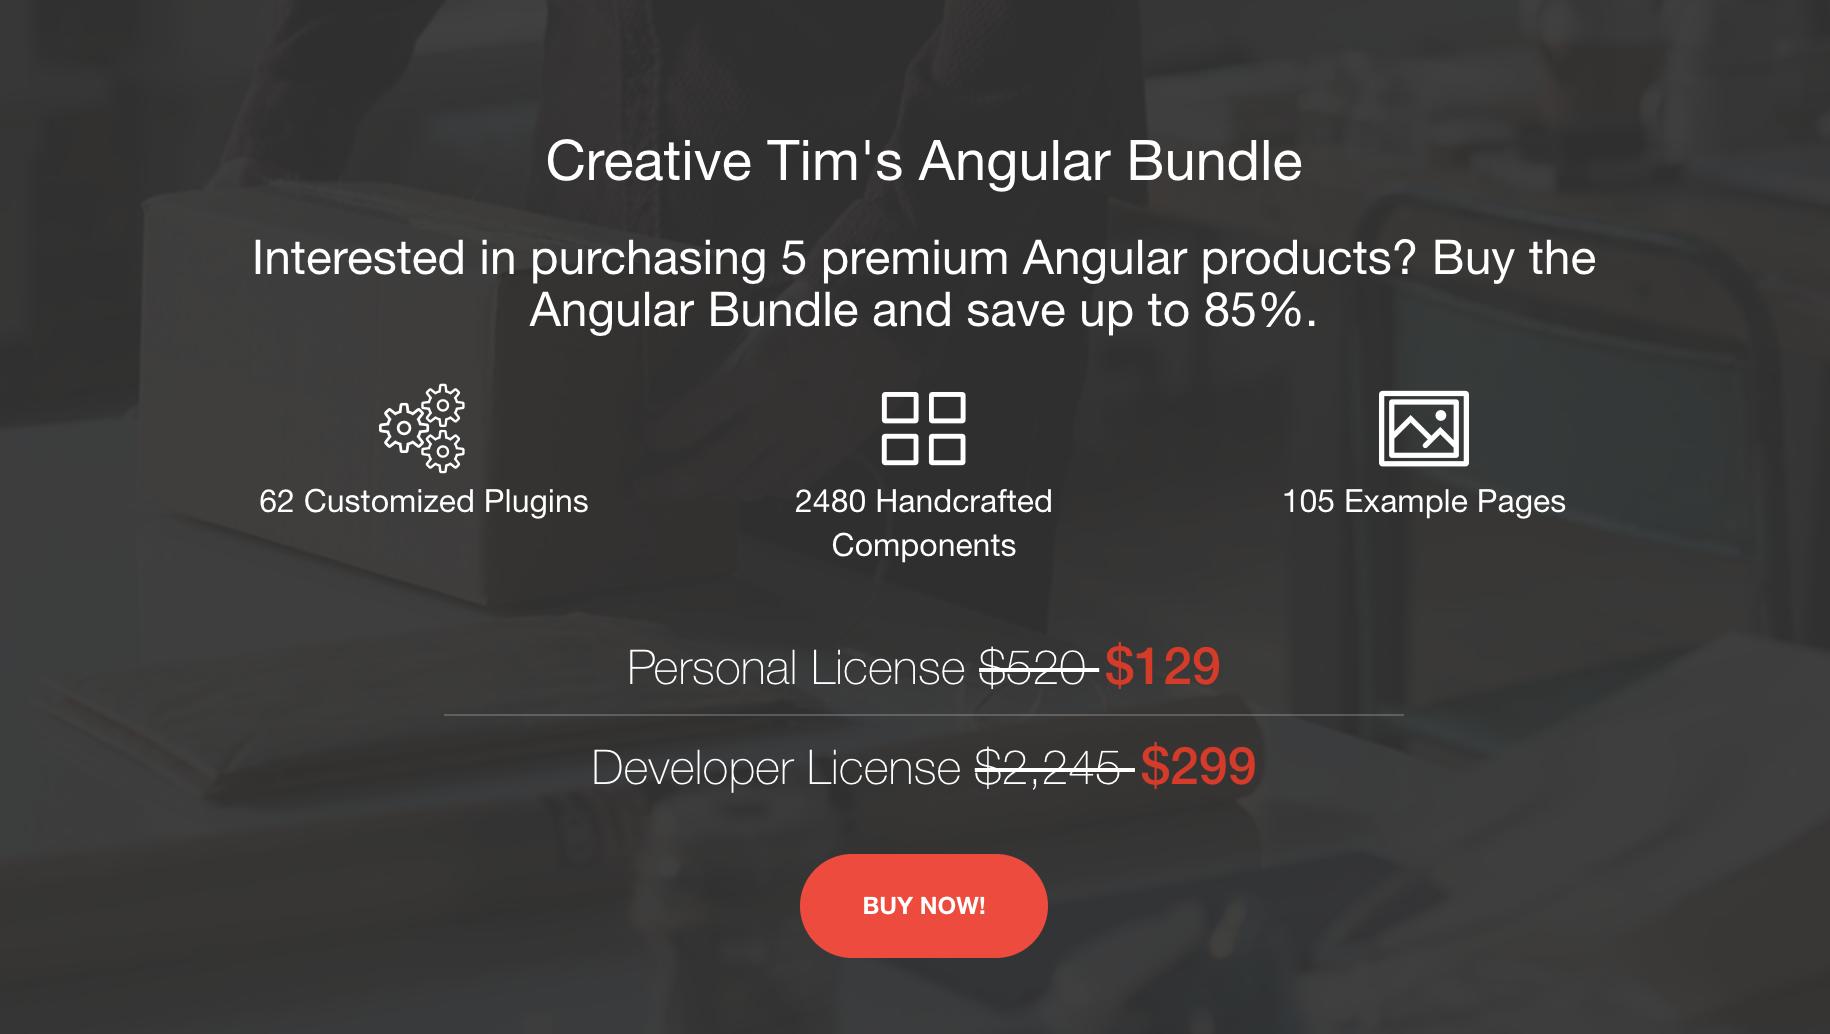 Premium Angular Bundle by Creative Tim 😻 - Angular